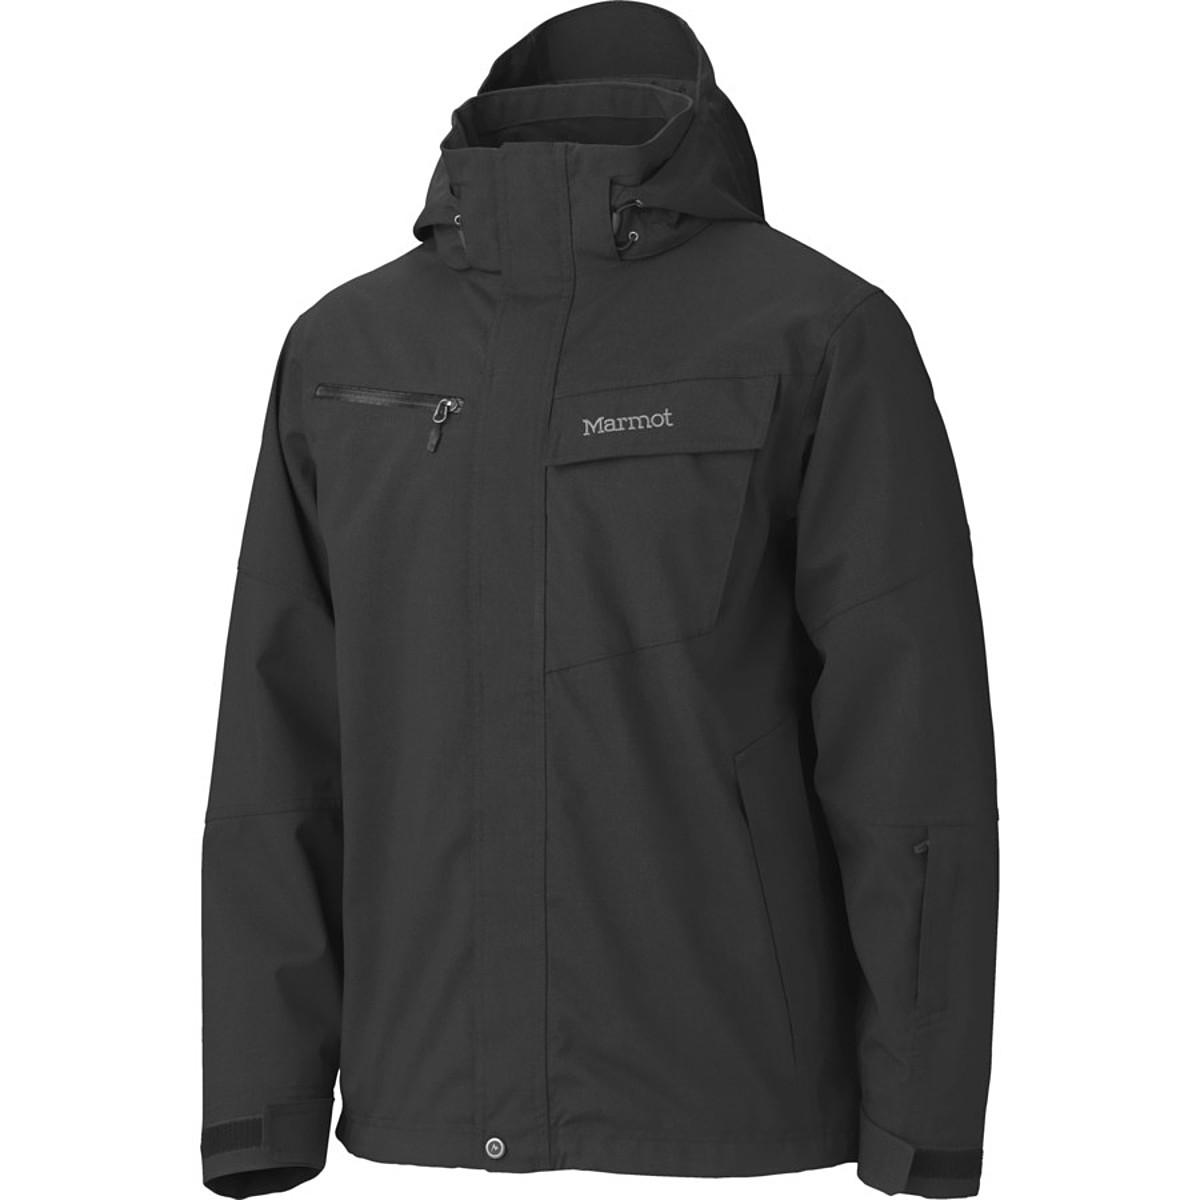 Marmot Great Scott Jacket